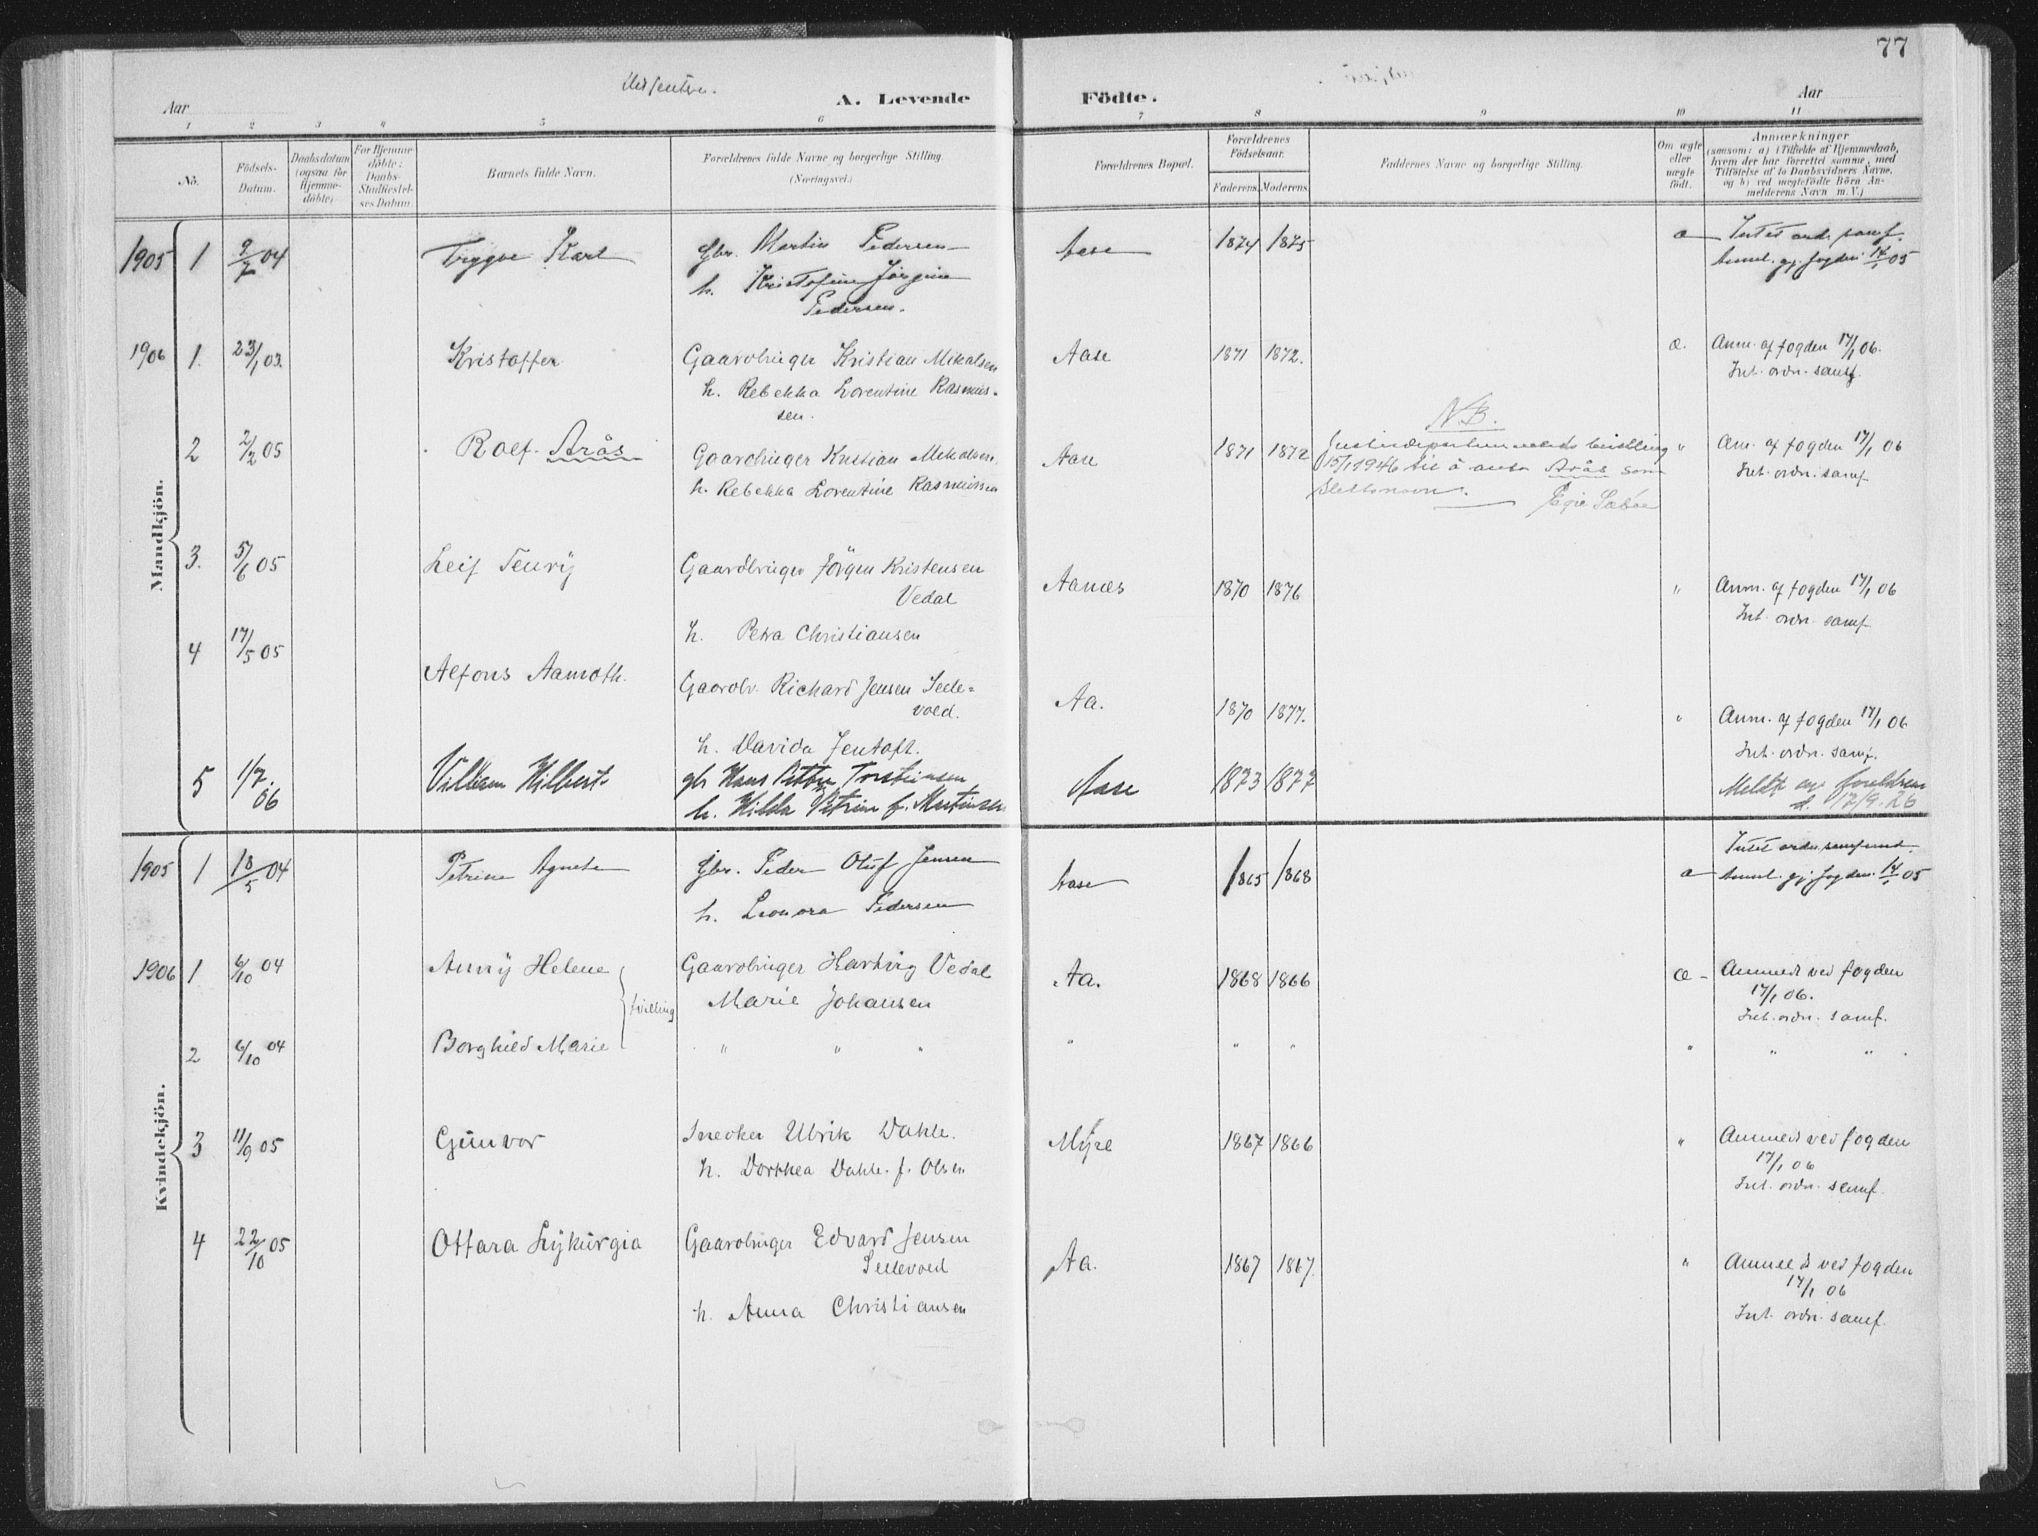 SAT, Ministerialprotokoller, klokkerbøker og fødselsregistre - Nordland, 897/L1400: Ministerialbok nr. 897A07, 1897-1908, s. 77